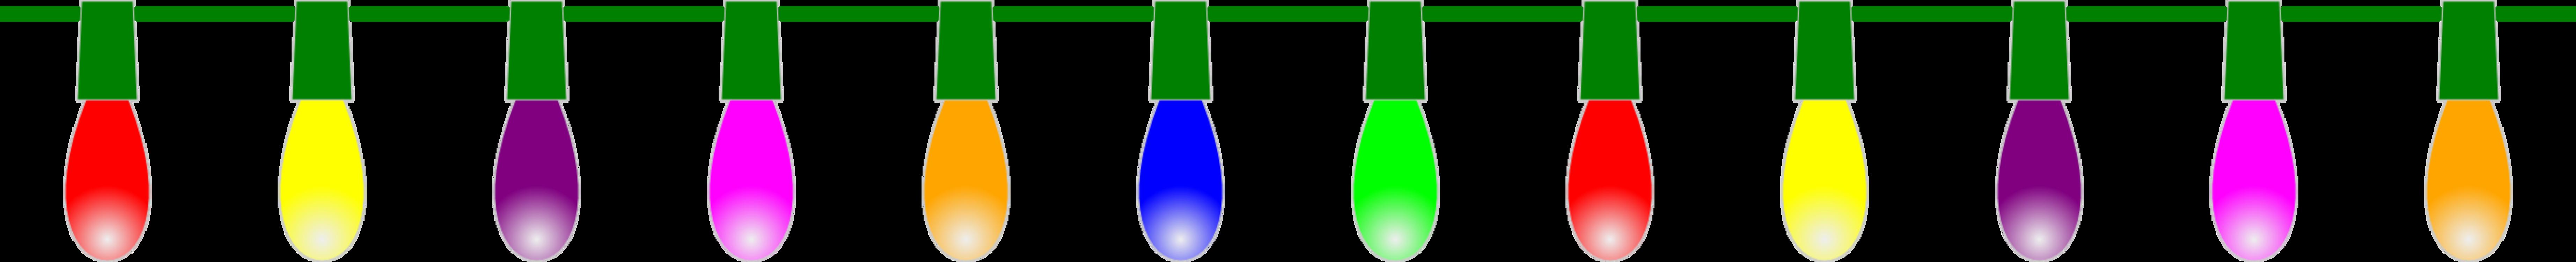 Angle,Symmetry,Area